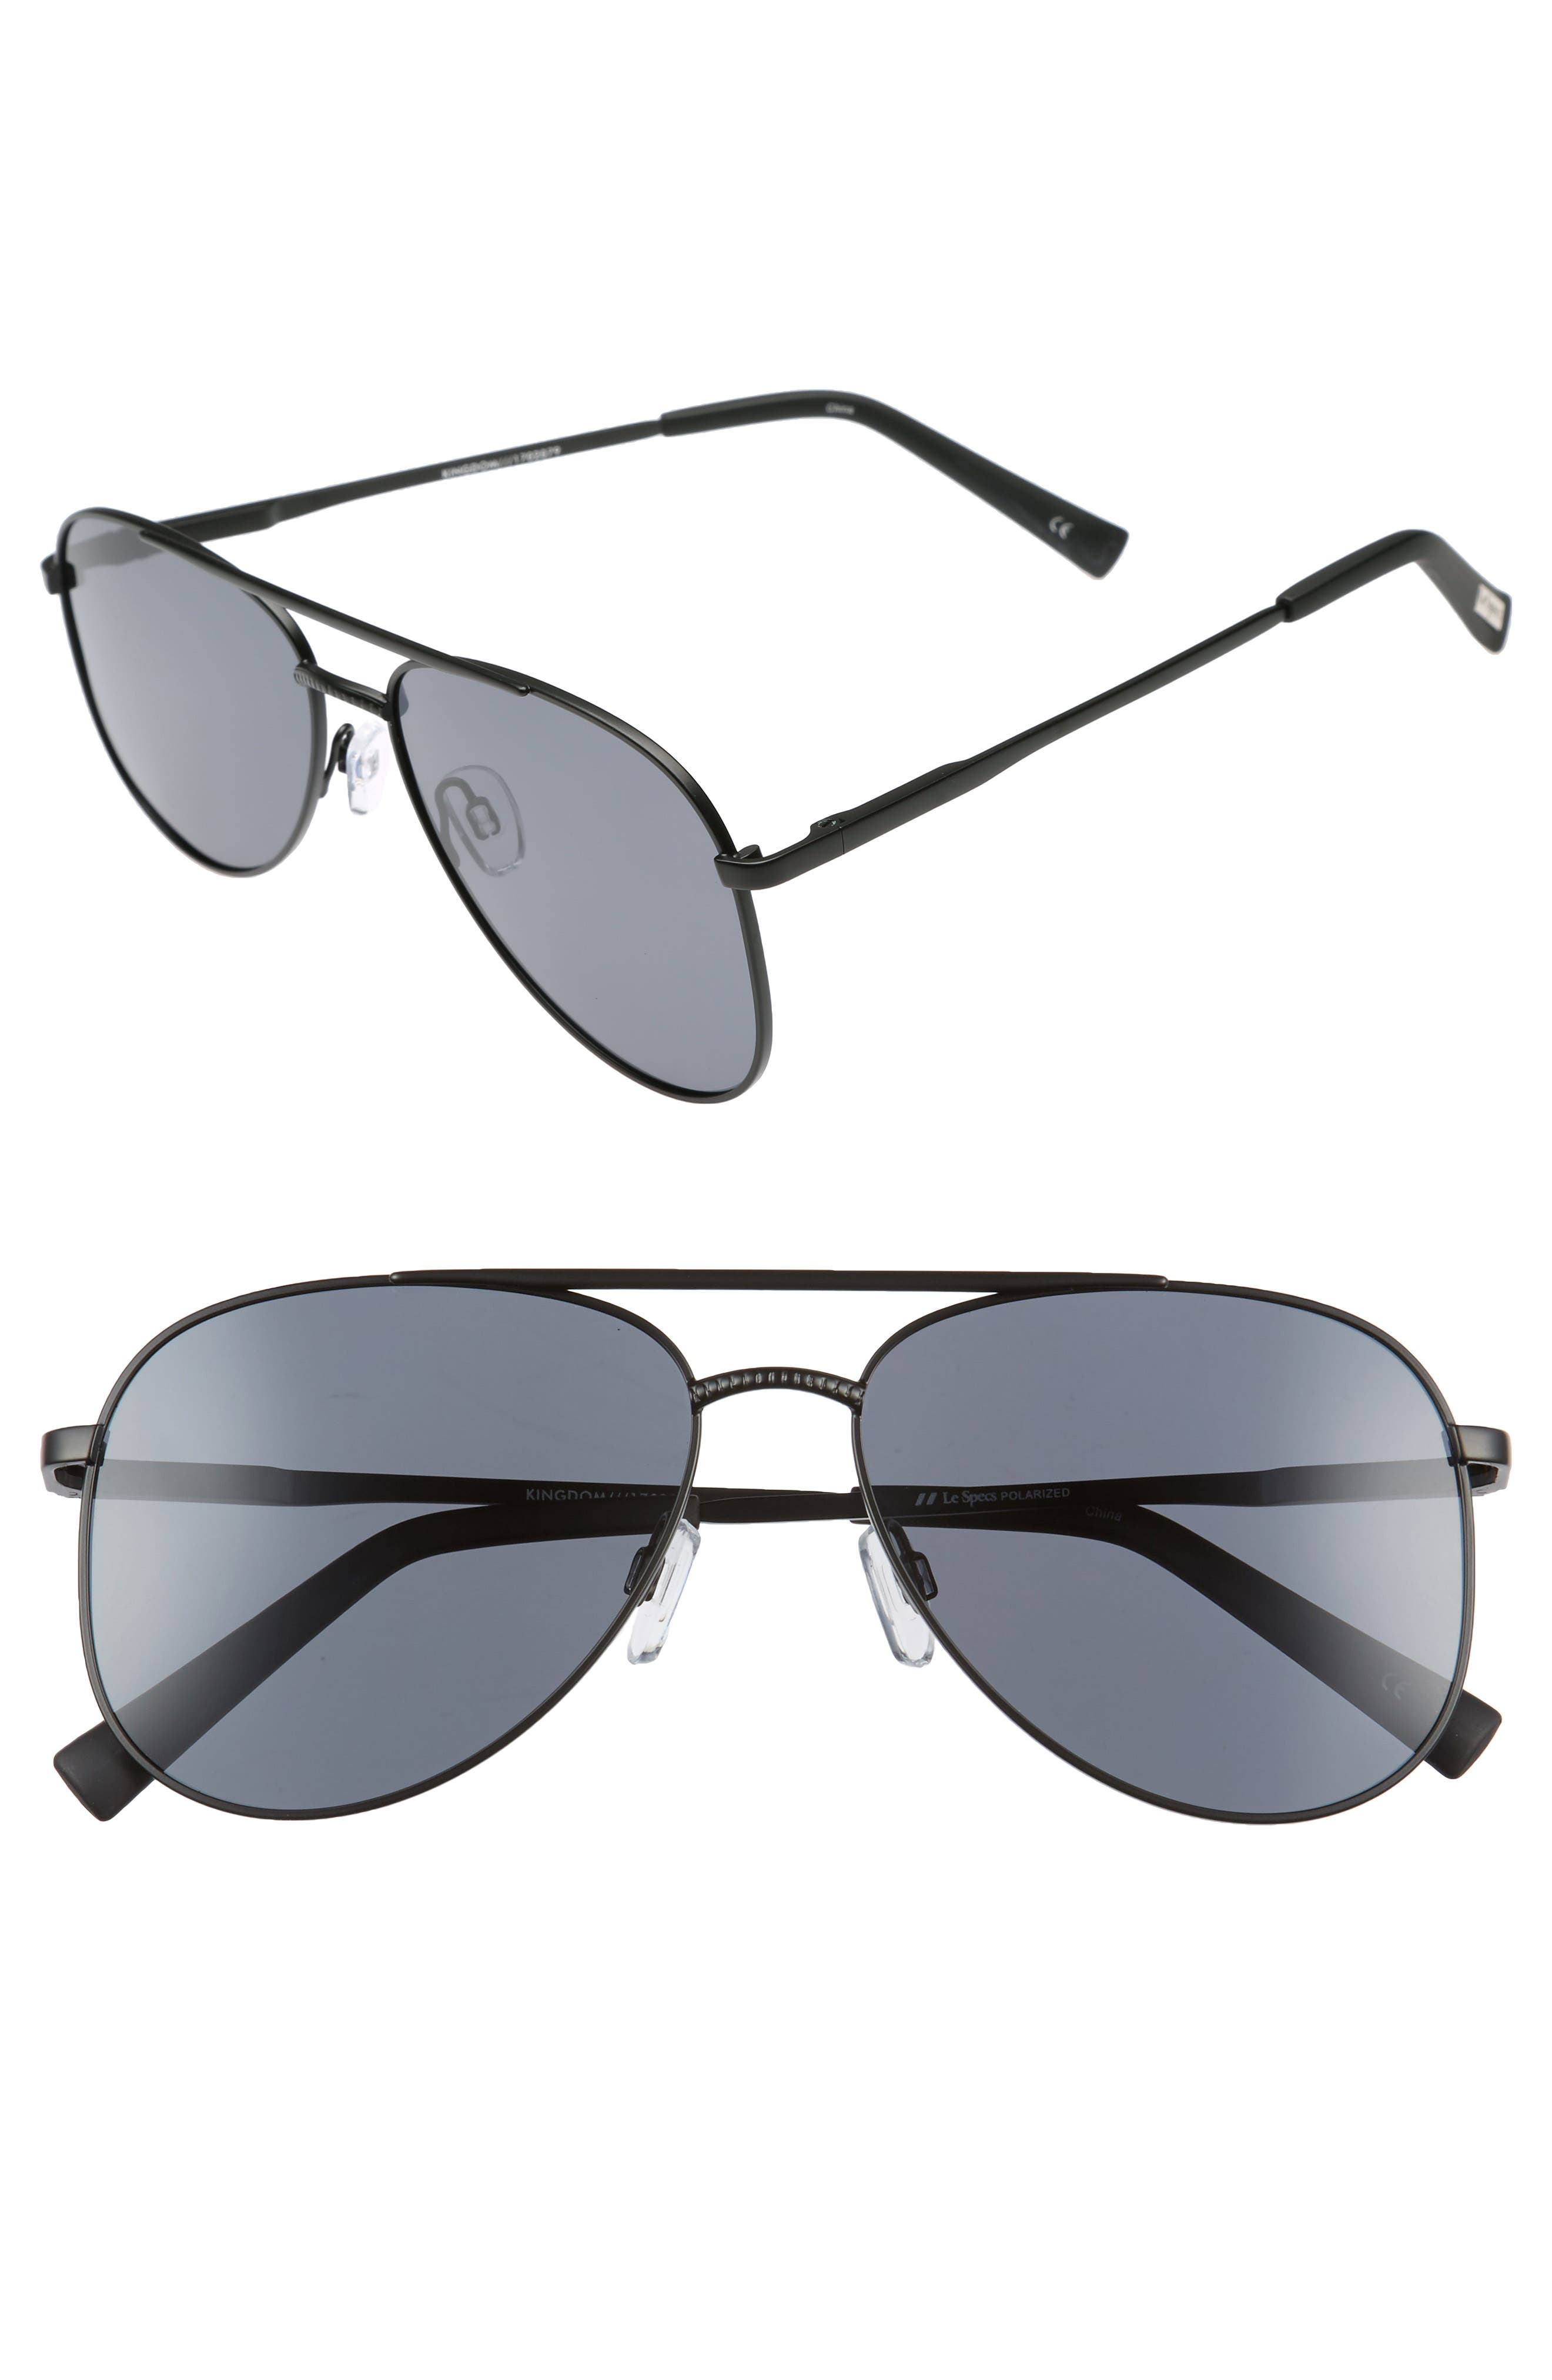 Kingdom 57mm Polarized Aviator Sunglasses,                         Main,                         color, Matte Black